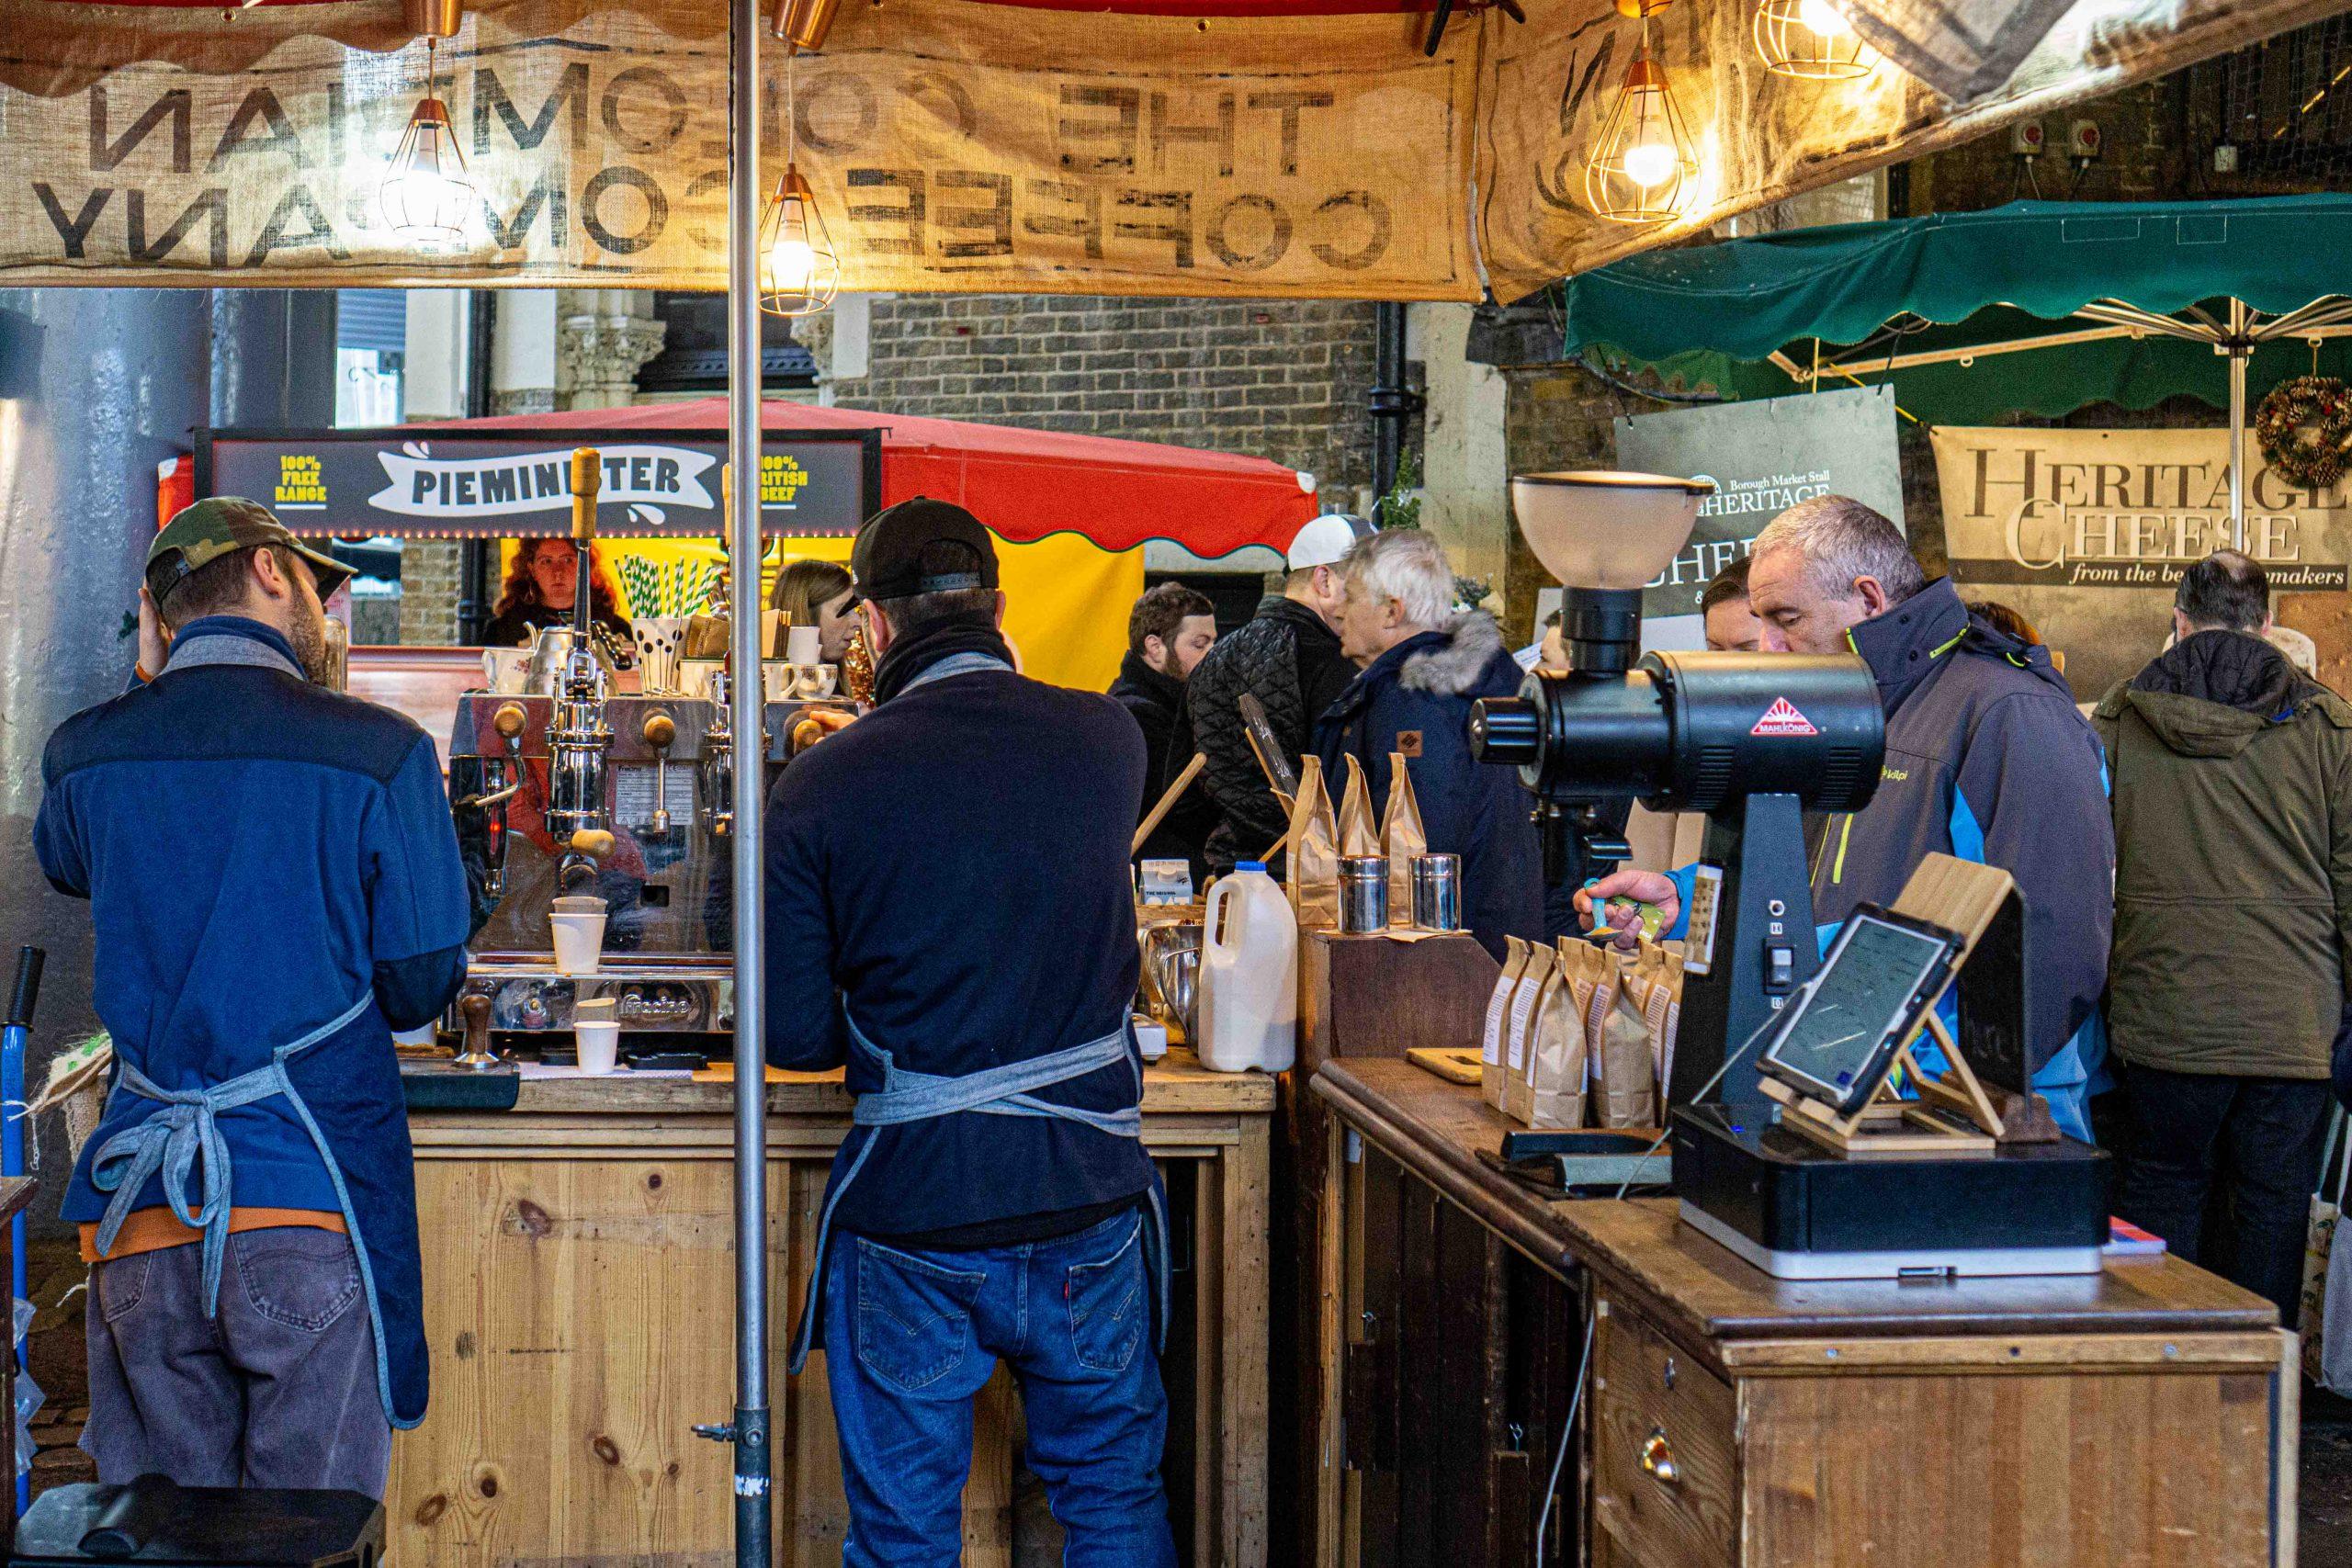 Das sind die besten Street Food Märkte in London